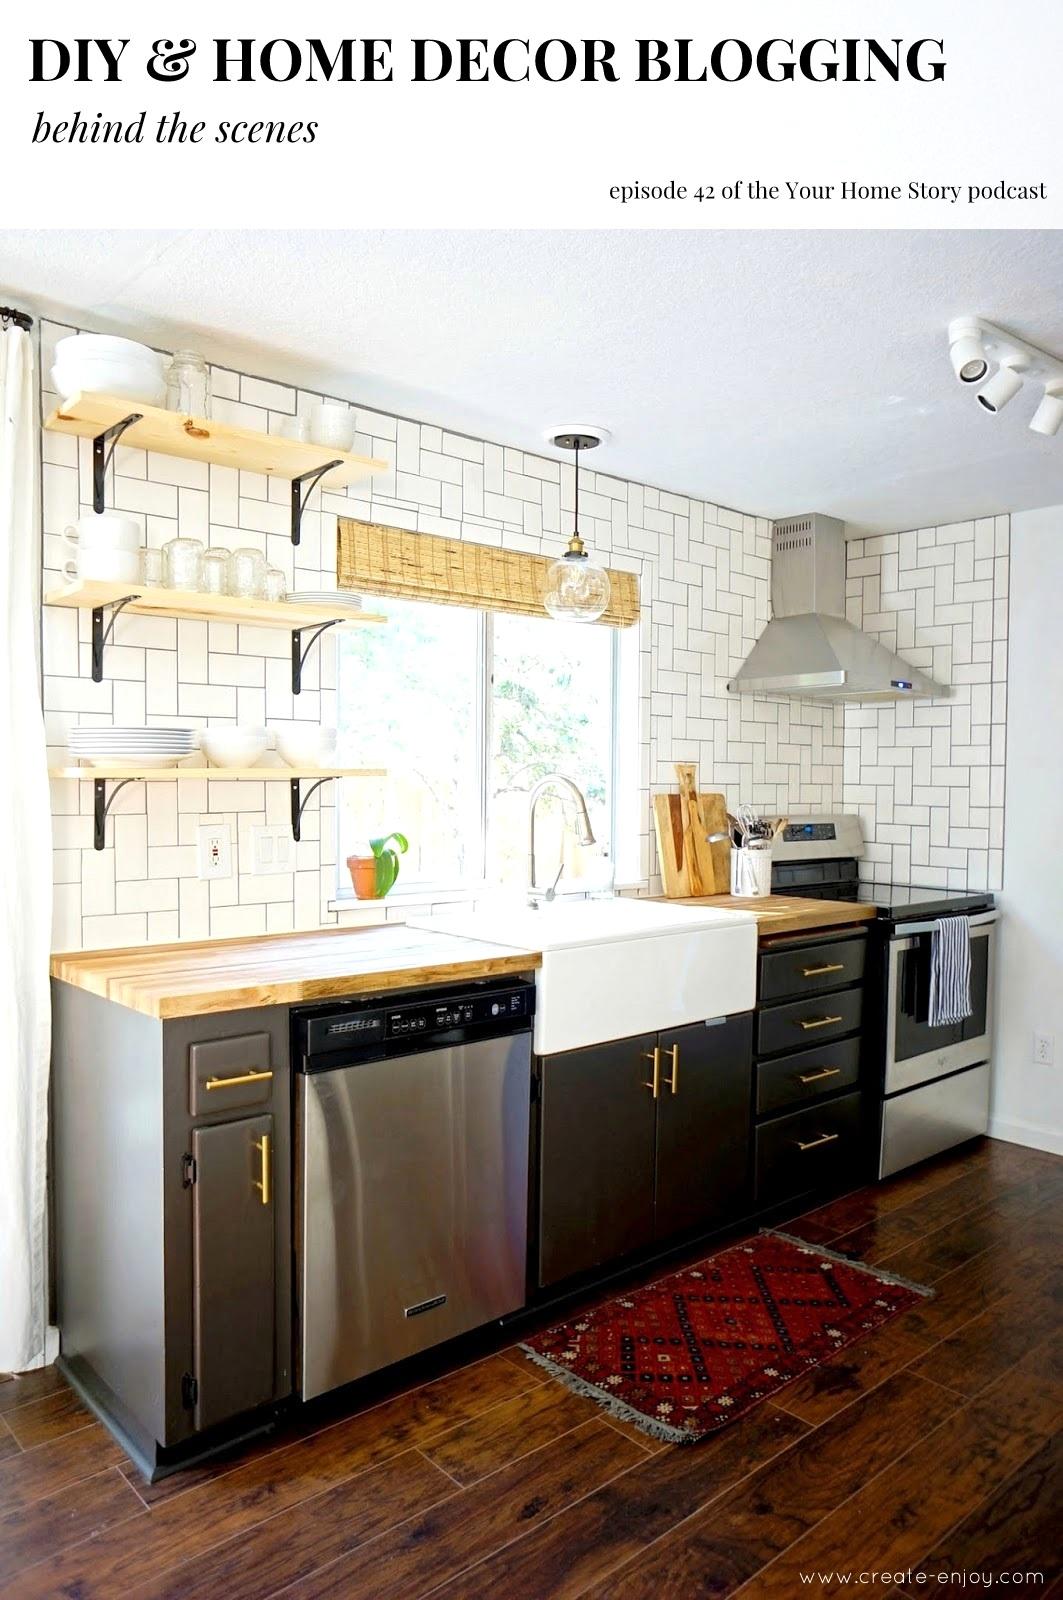 Diy Home Decor Blogging Behind The Scenes Create Enjoy